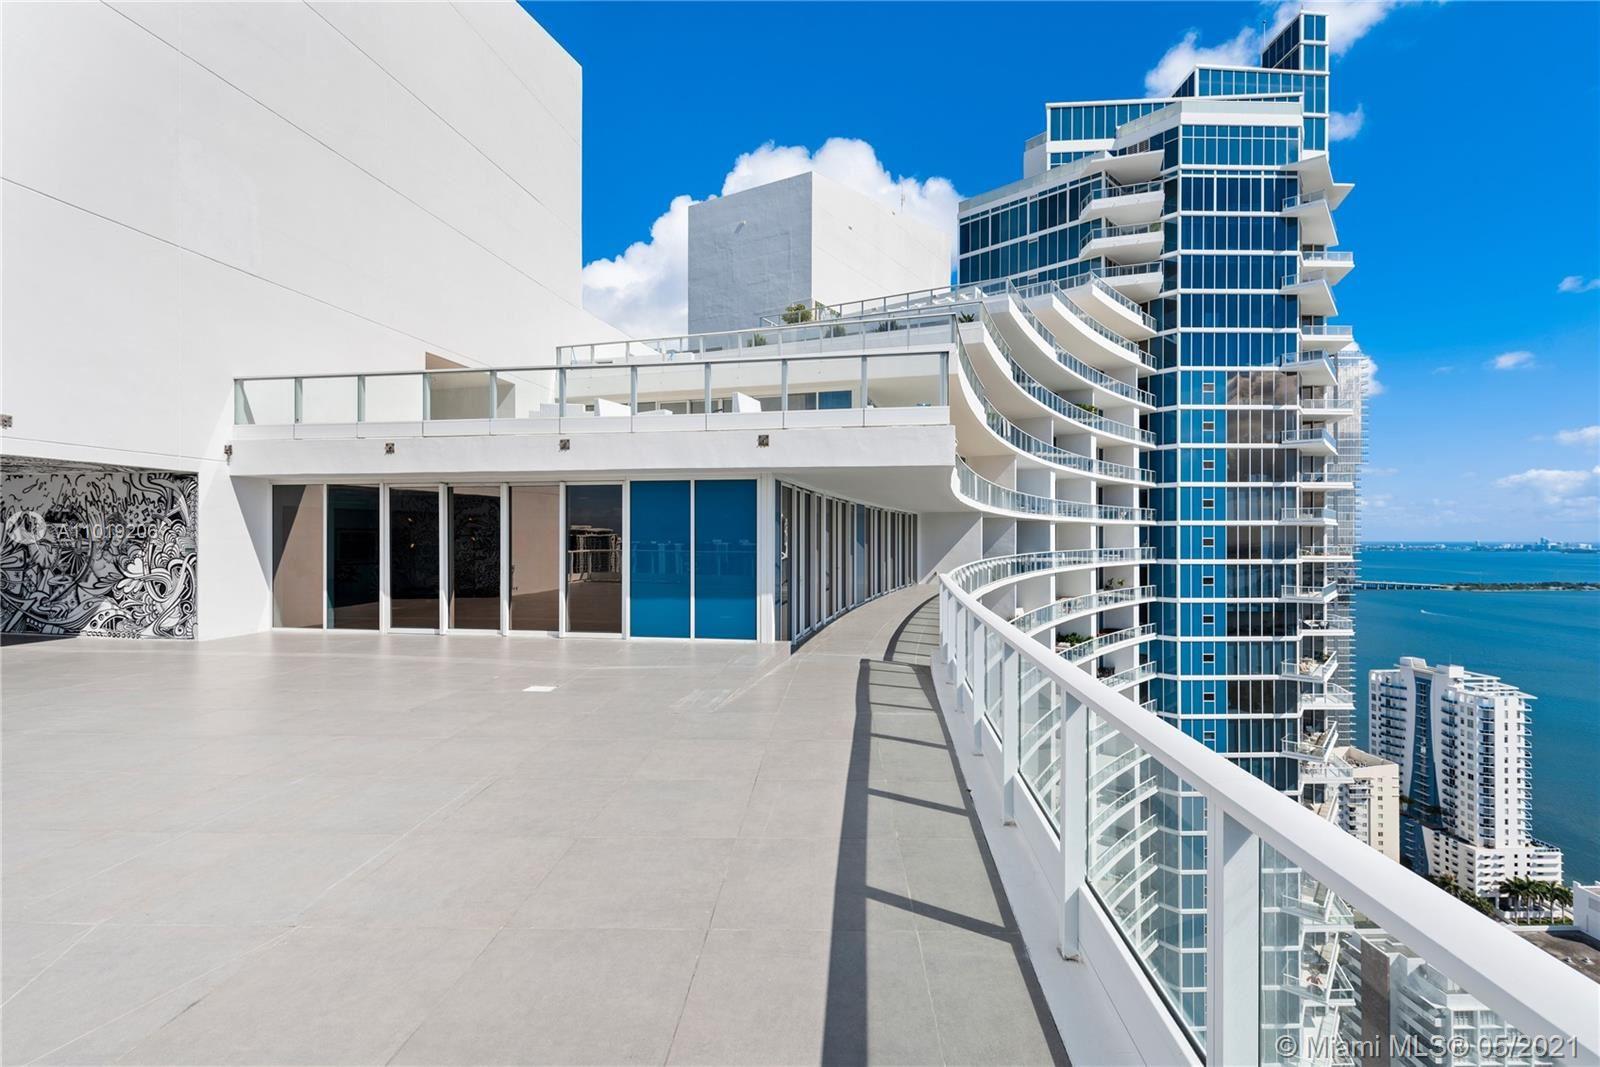 2020 N Bayshore Dr #PH3807, Miami, FL 33137 - #: A11019206